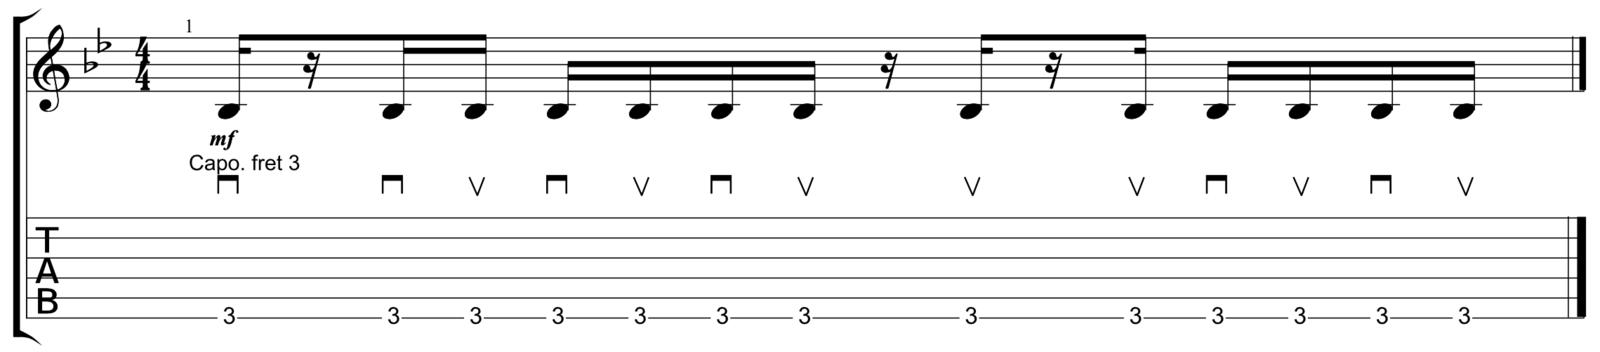 Acoustic Verse 1